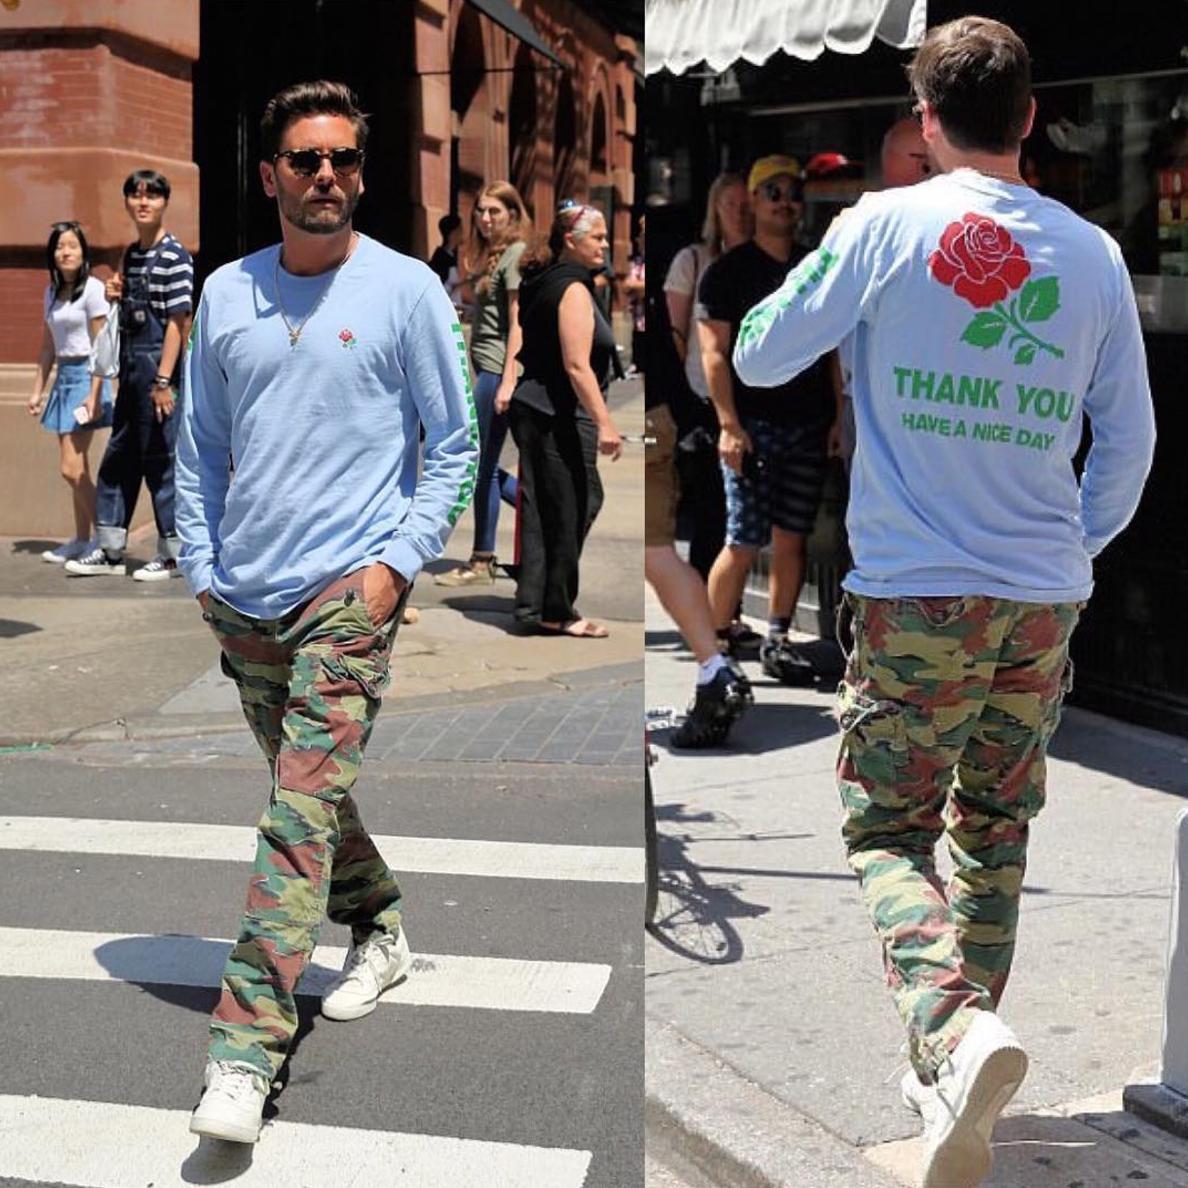 SPOTTED: Scott Disick In Chinatown Market T-Shirt, Ralph Lauren Cargos And Adidas YEEZY Calabasas Sneakers